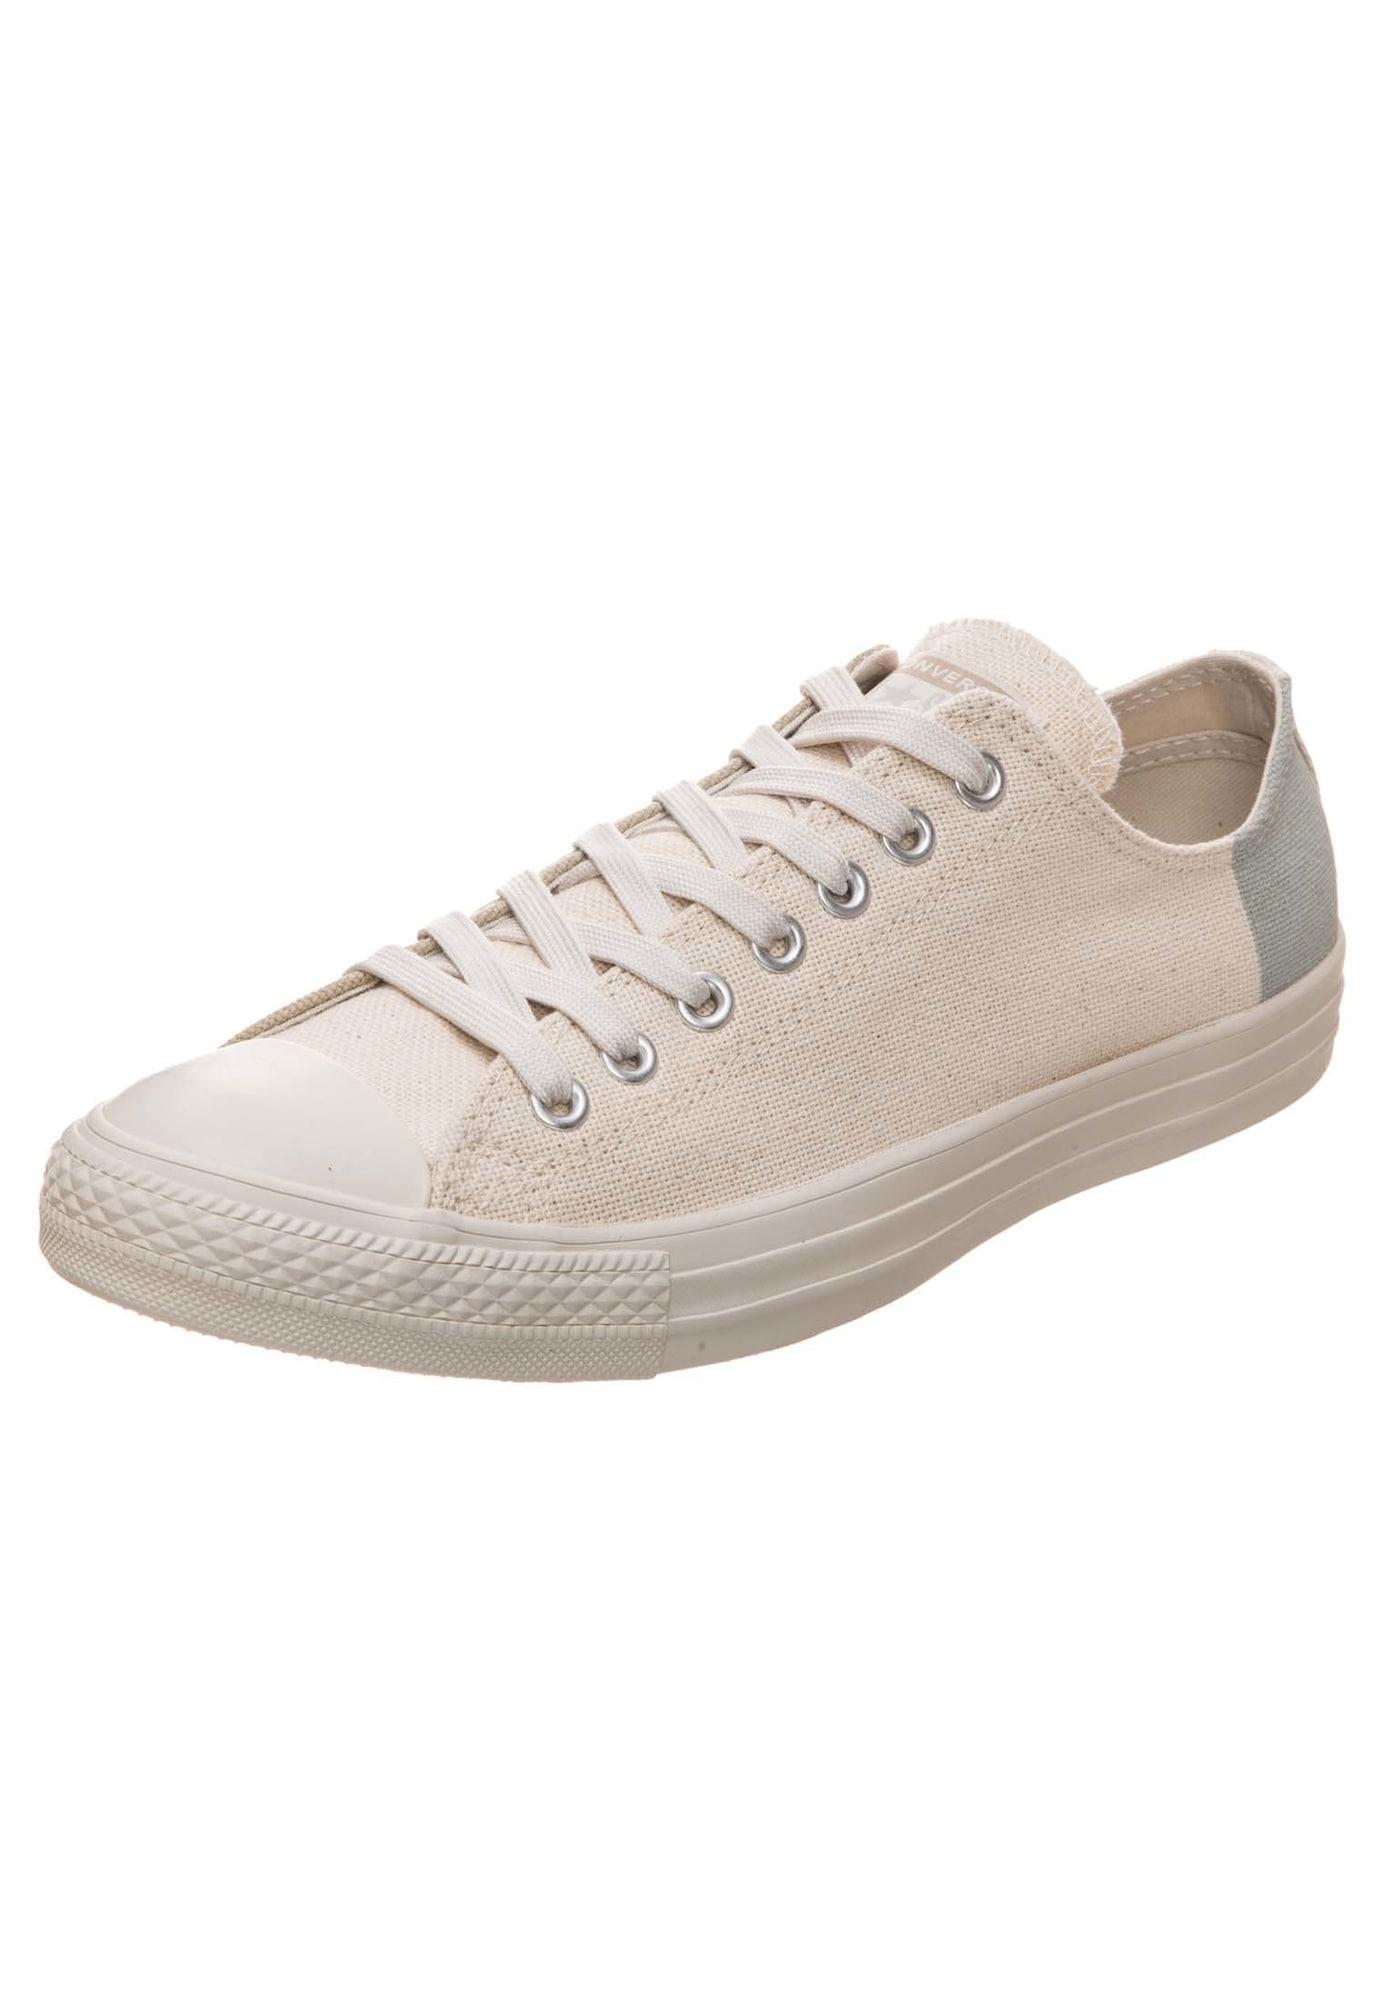 c96e4fd6ef4 Converse Dames Sneakers Laag Chuck Taylor All Star Ox Beige Olijfgroen  Offwhite converse kopen in de